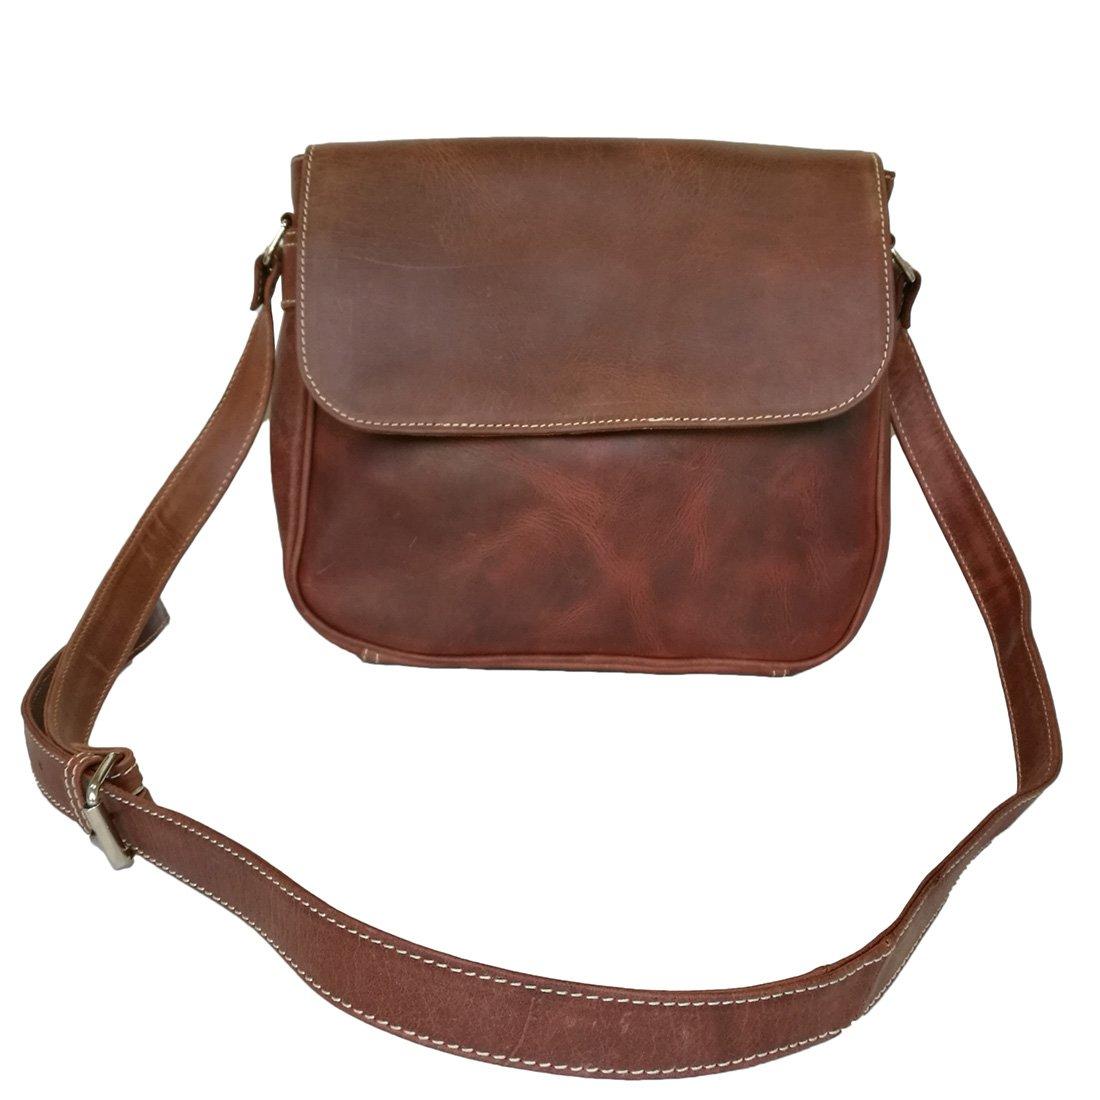 ab4cc125fd45 Ladies Buffalo Leather Purse Satchel Bag Women's Shoulder Cross Body ...